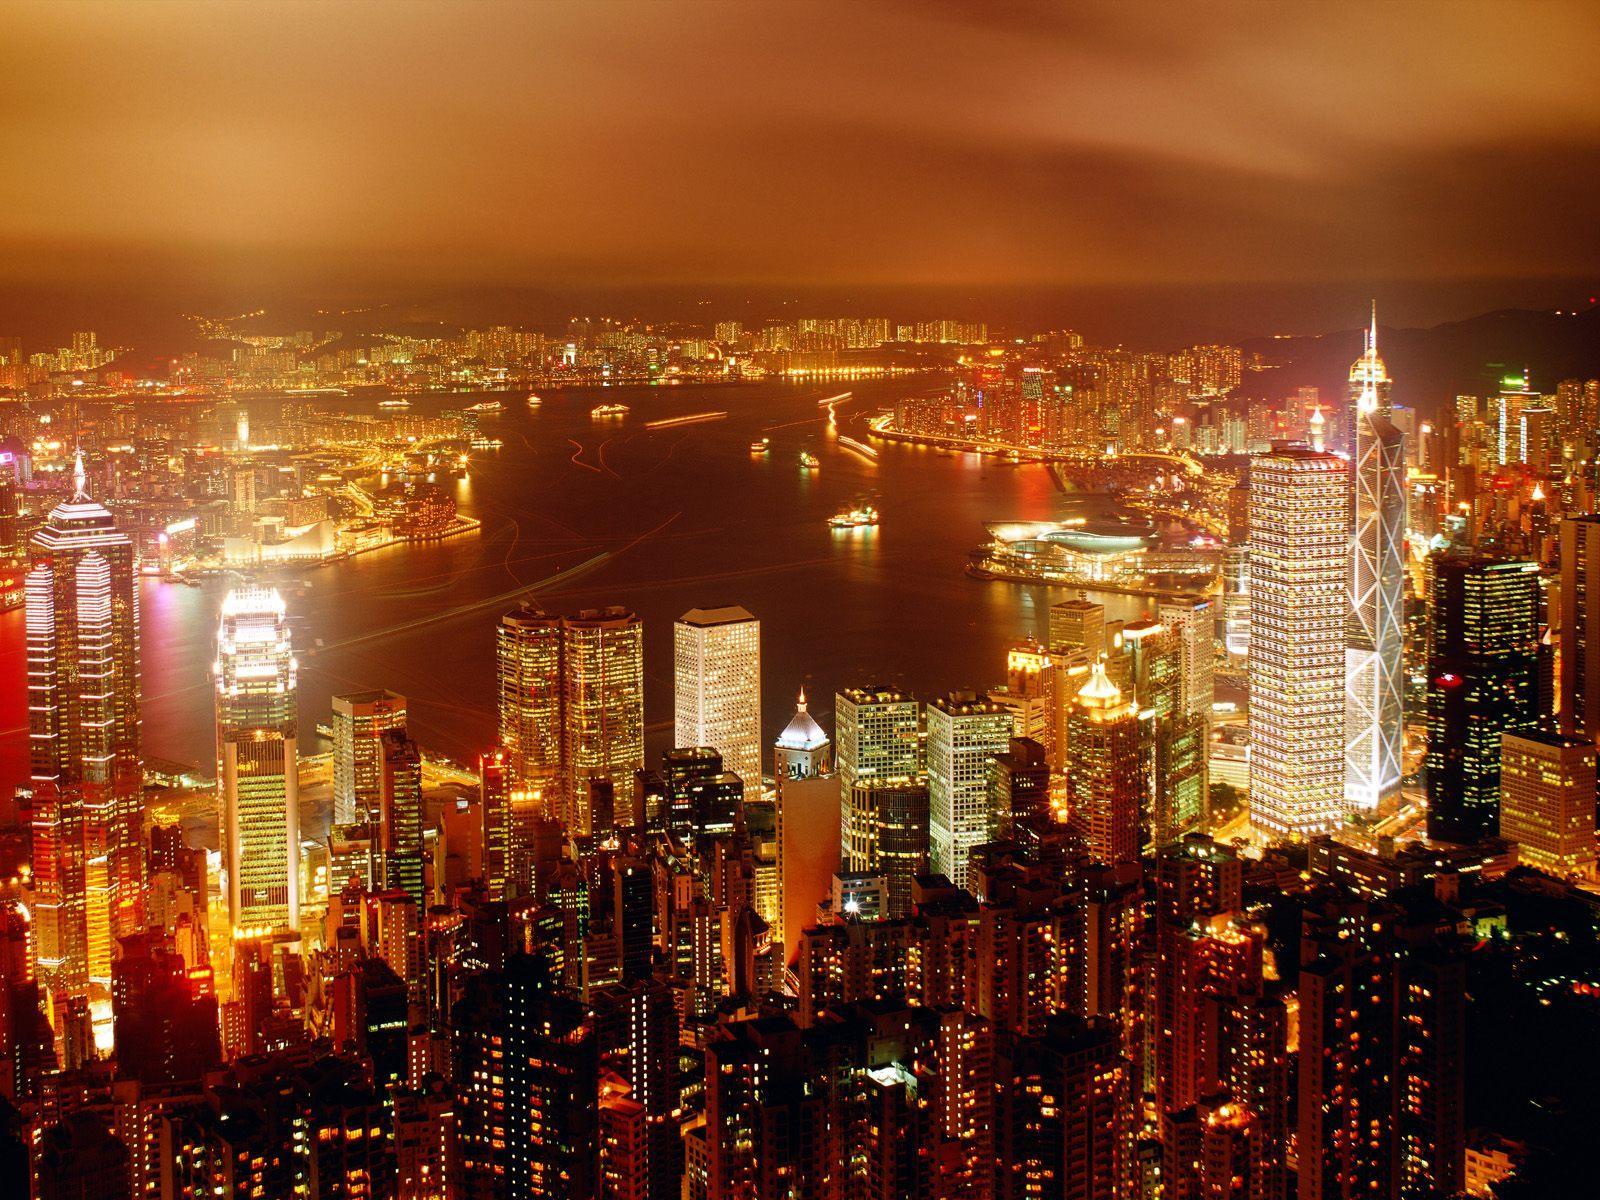 La tira muestra a Hong Kong